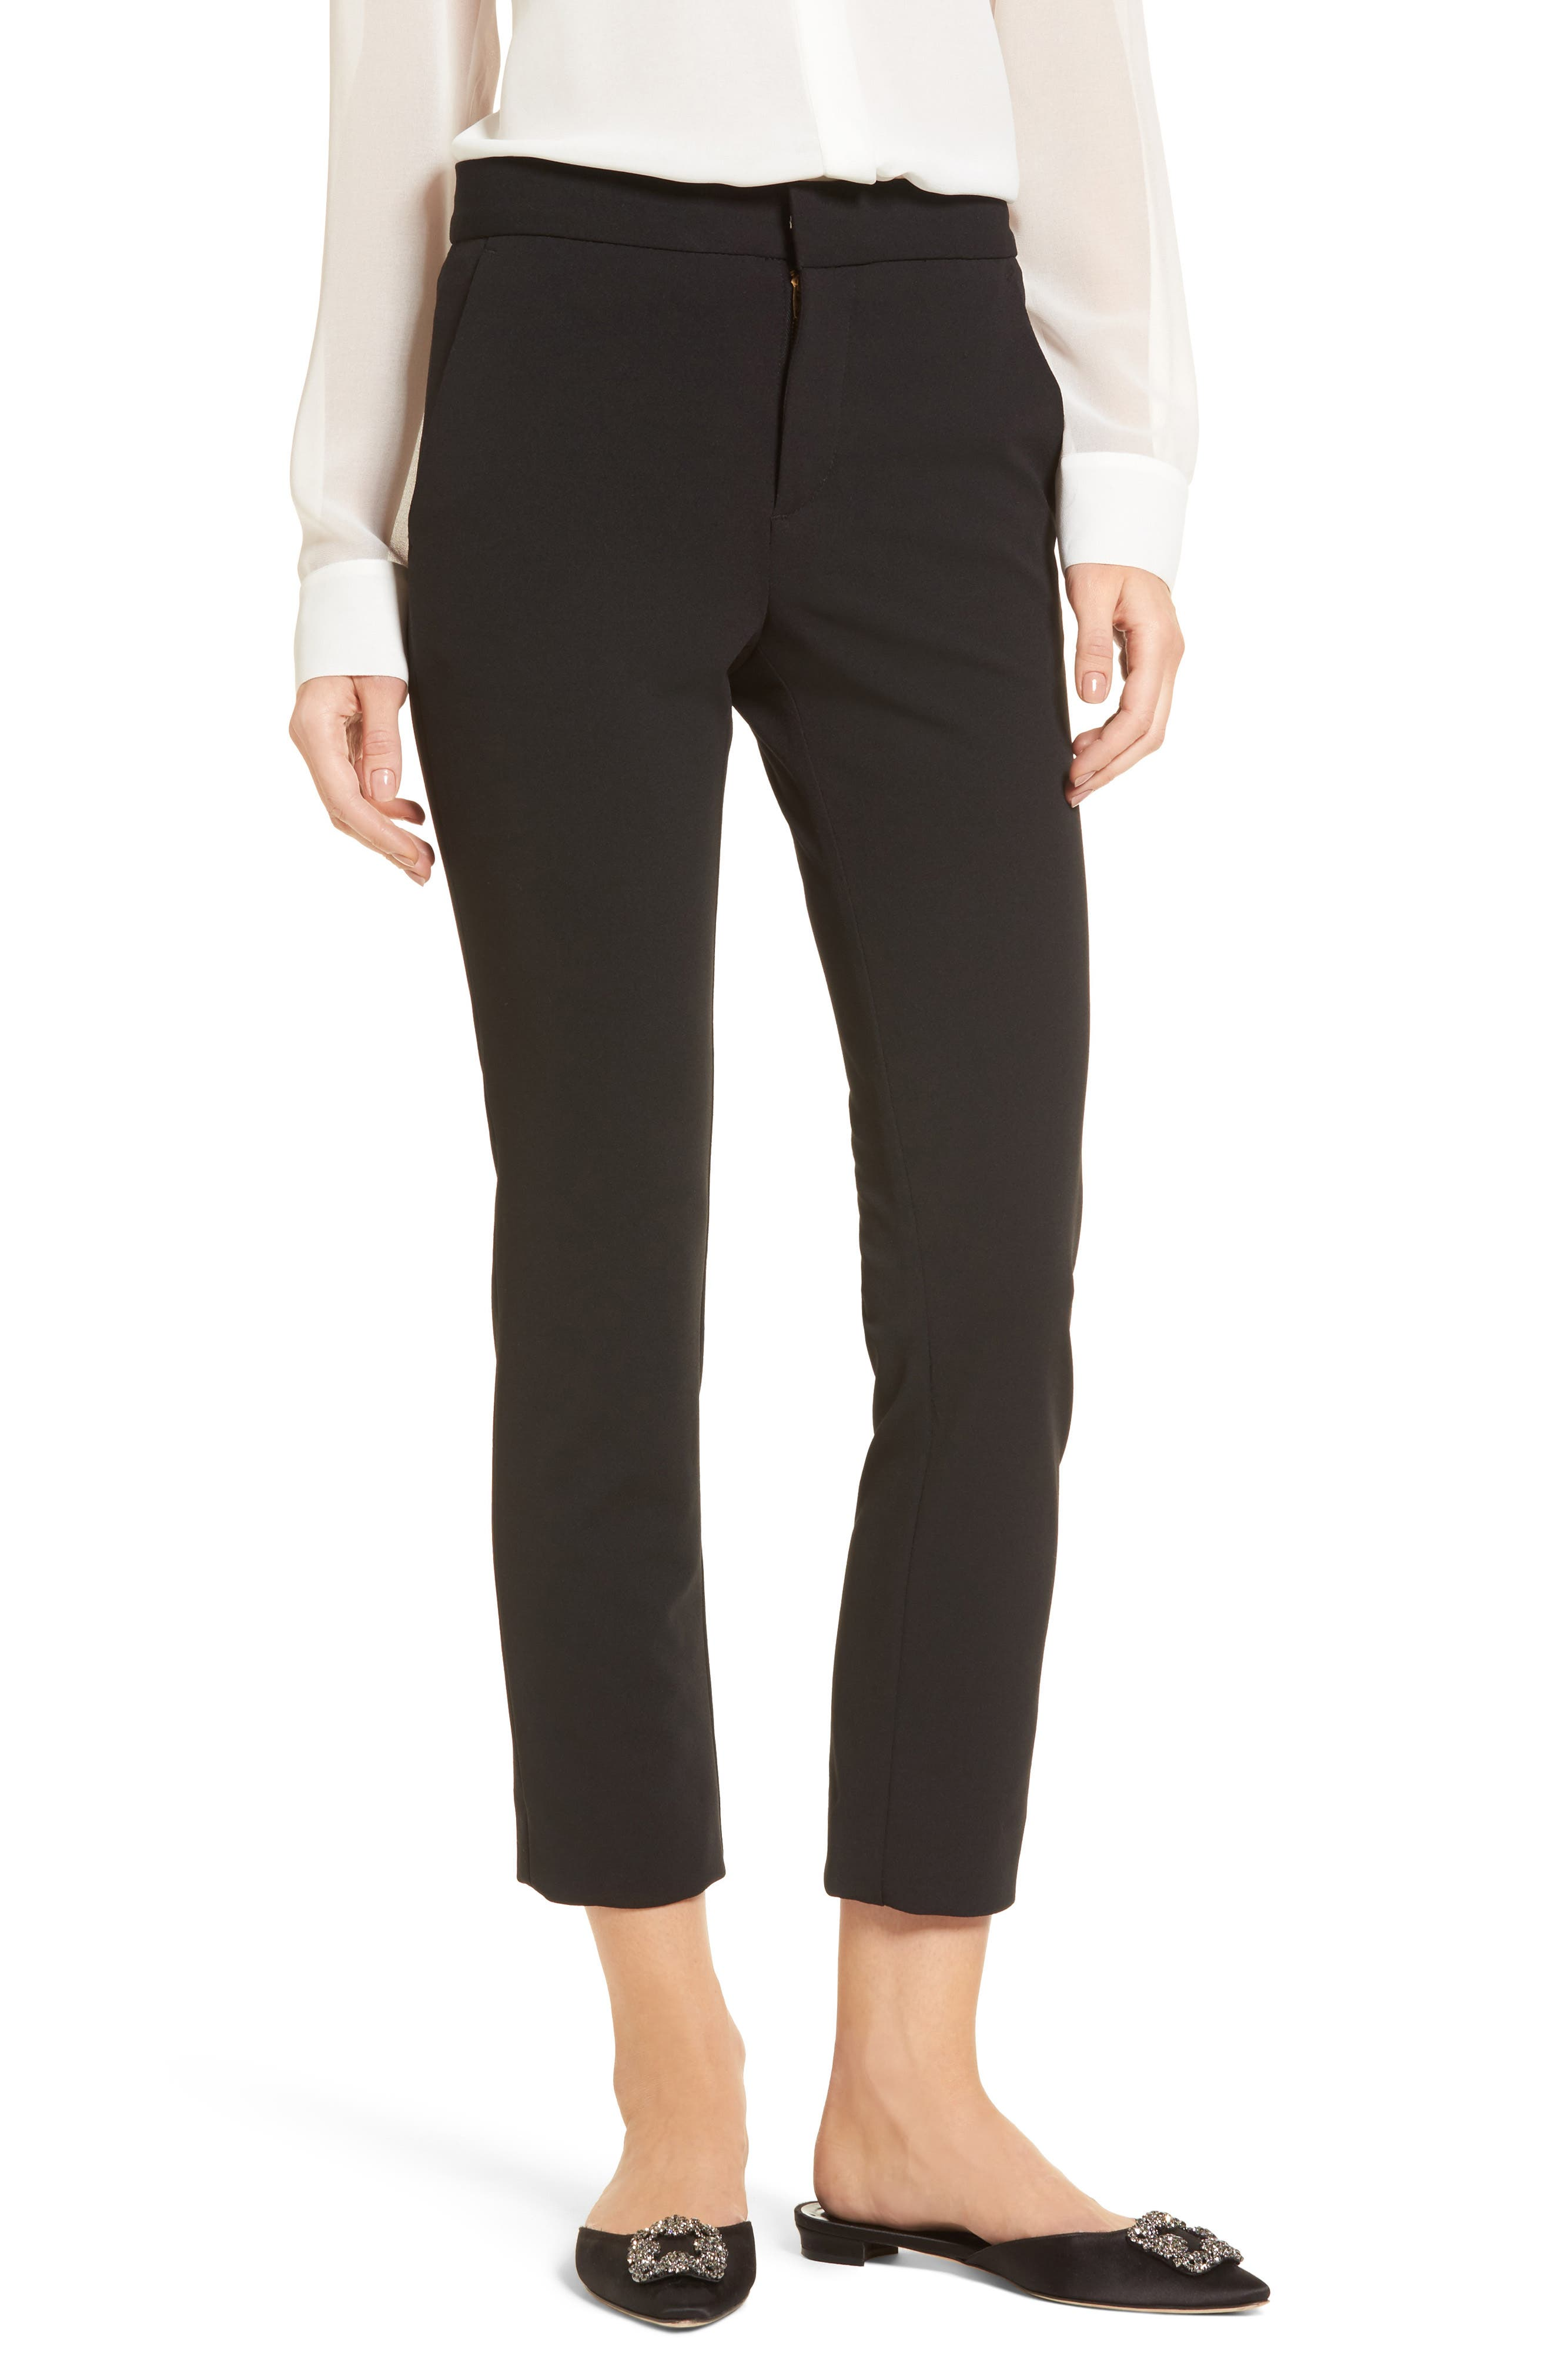 Lou Lou High Waist Crop Slim Trousers,                             Main thumbnail 1, color,                             001